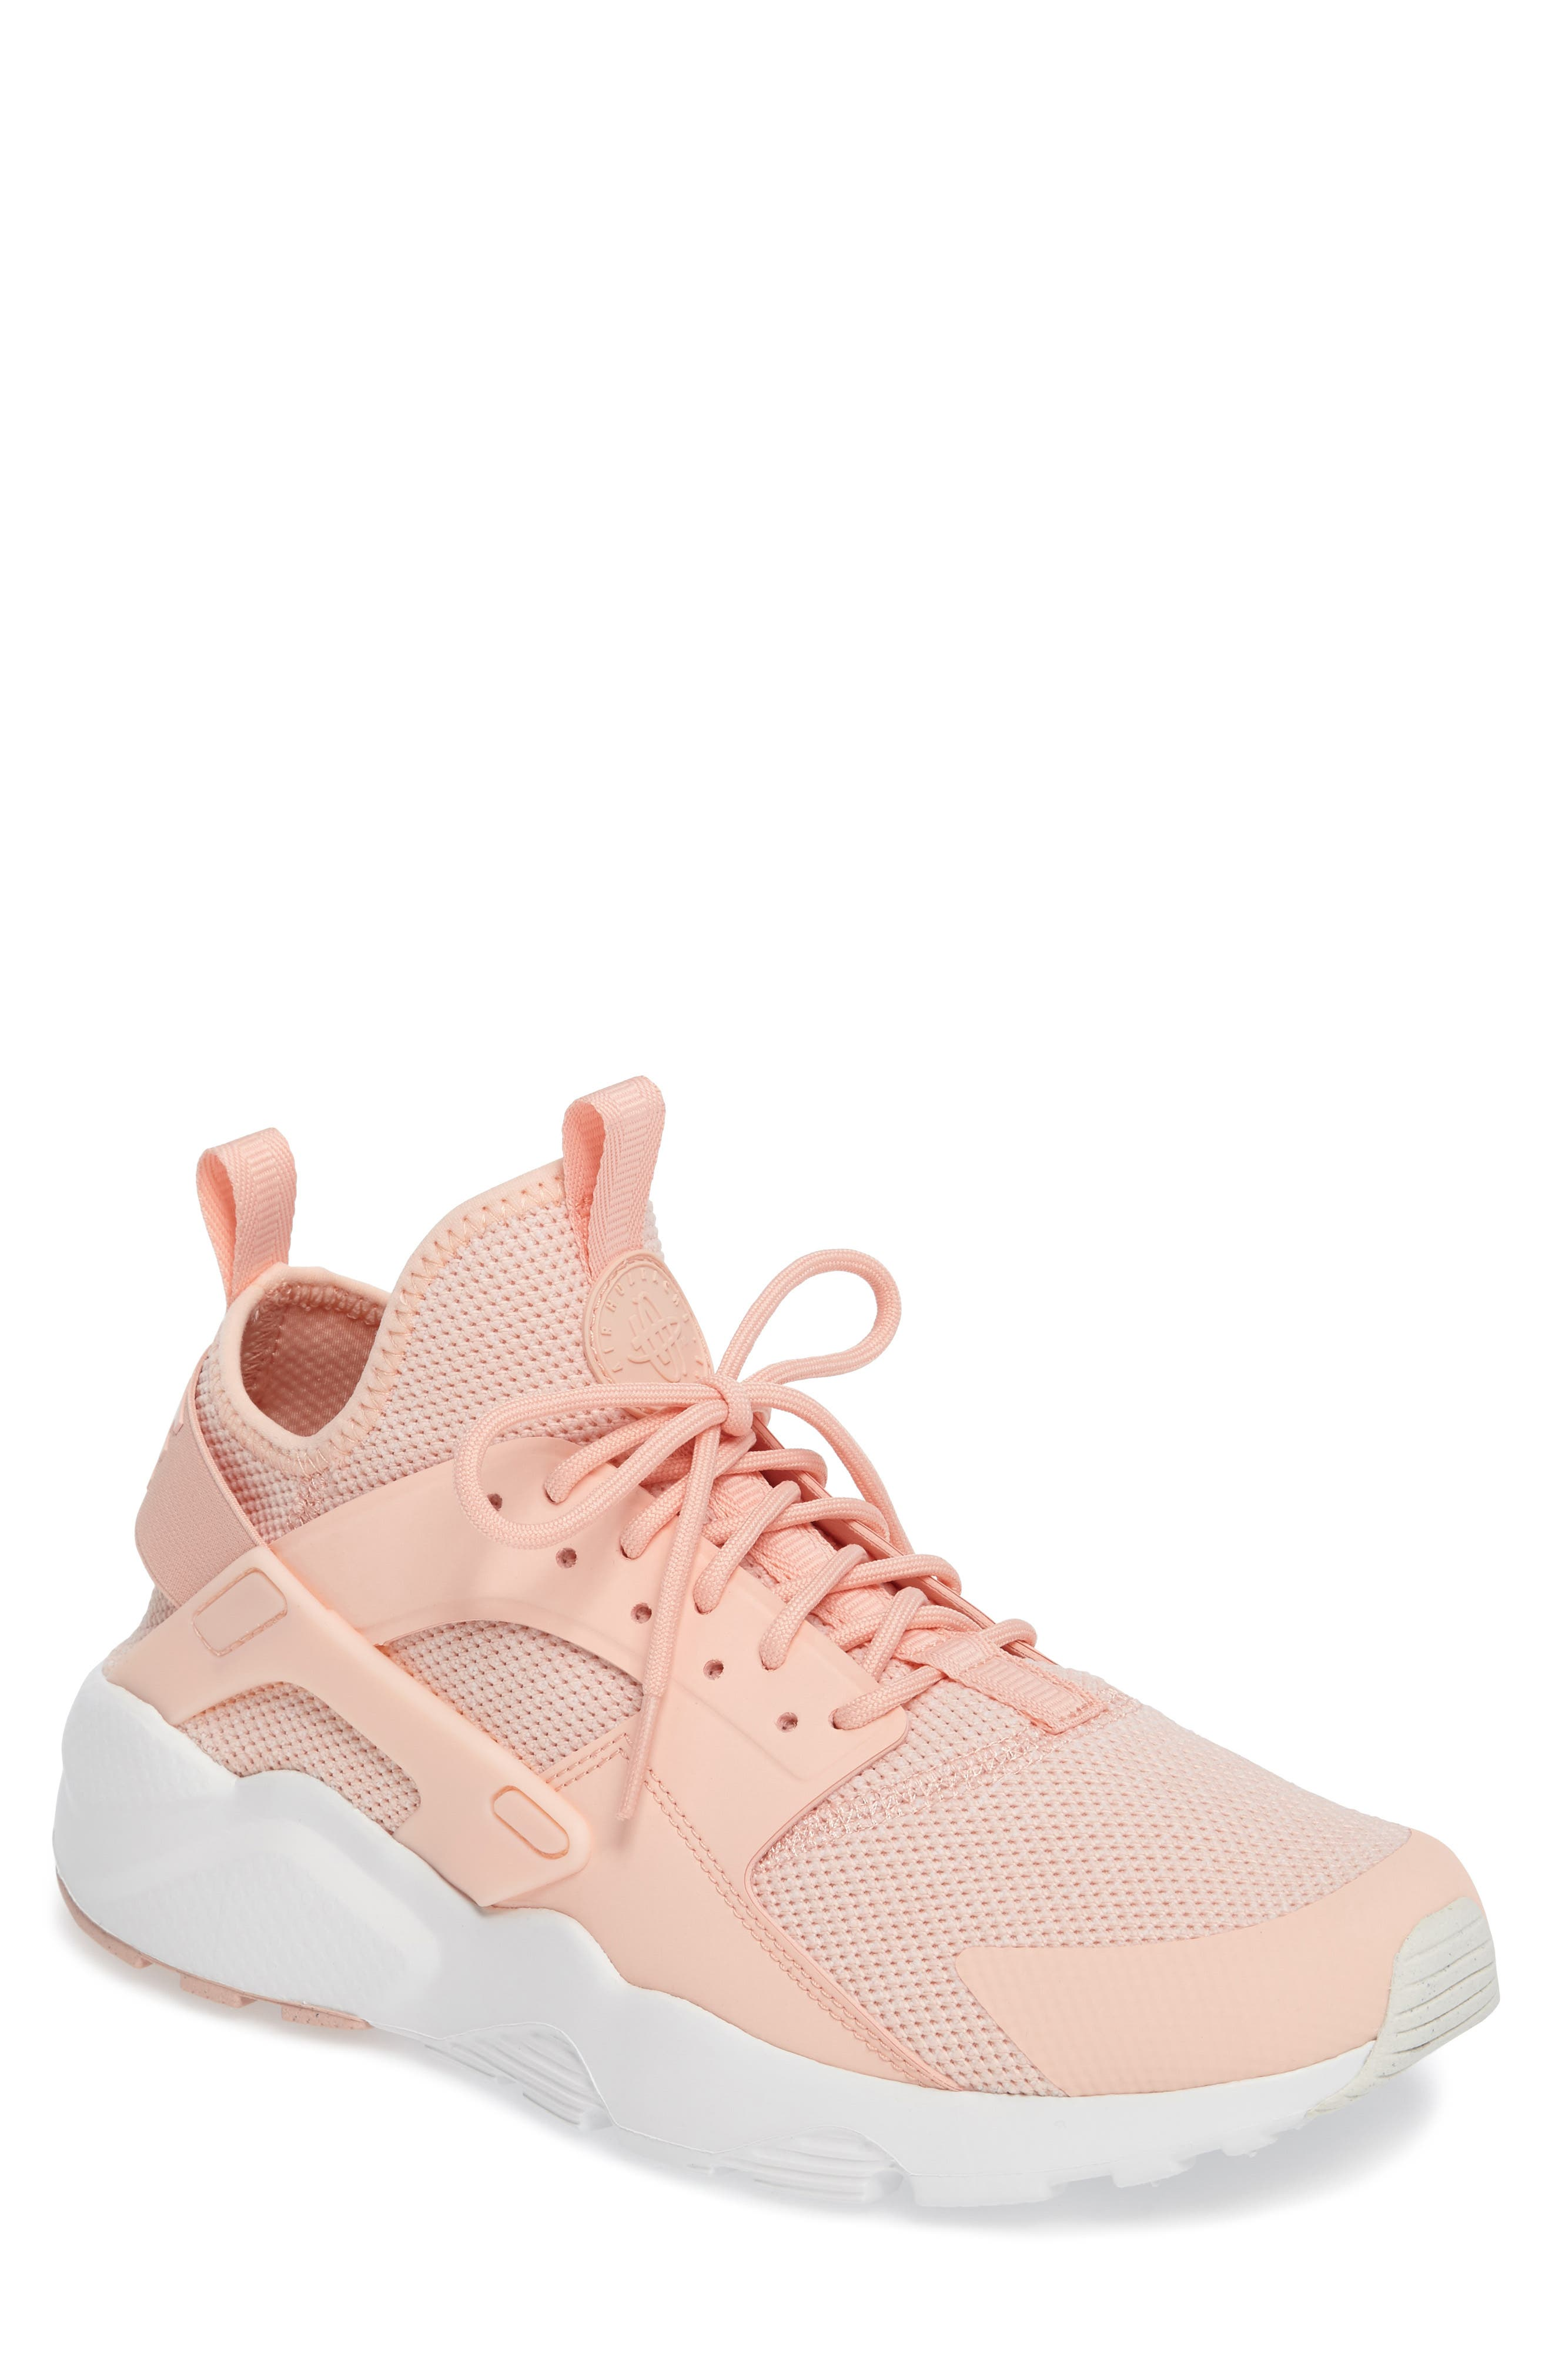 Alternate Image 1 Selected - Nike Air Huarache Ultra Breathe Sneaker (Men)